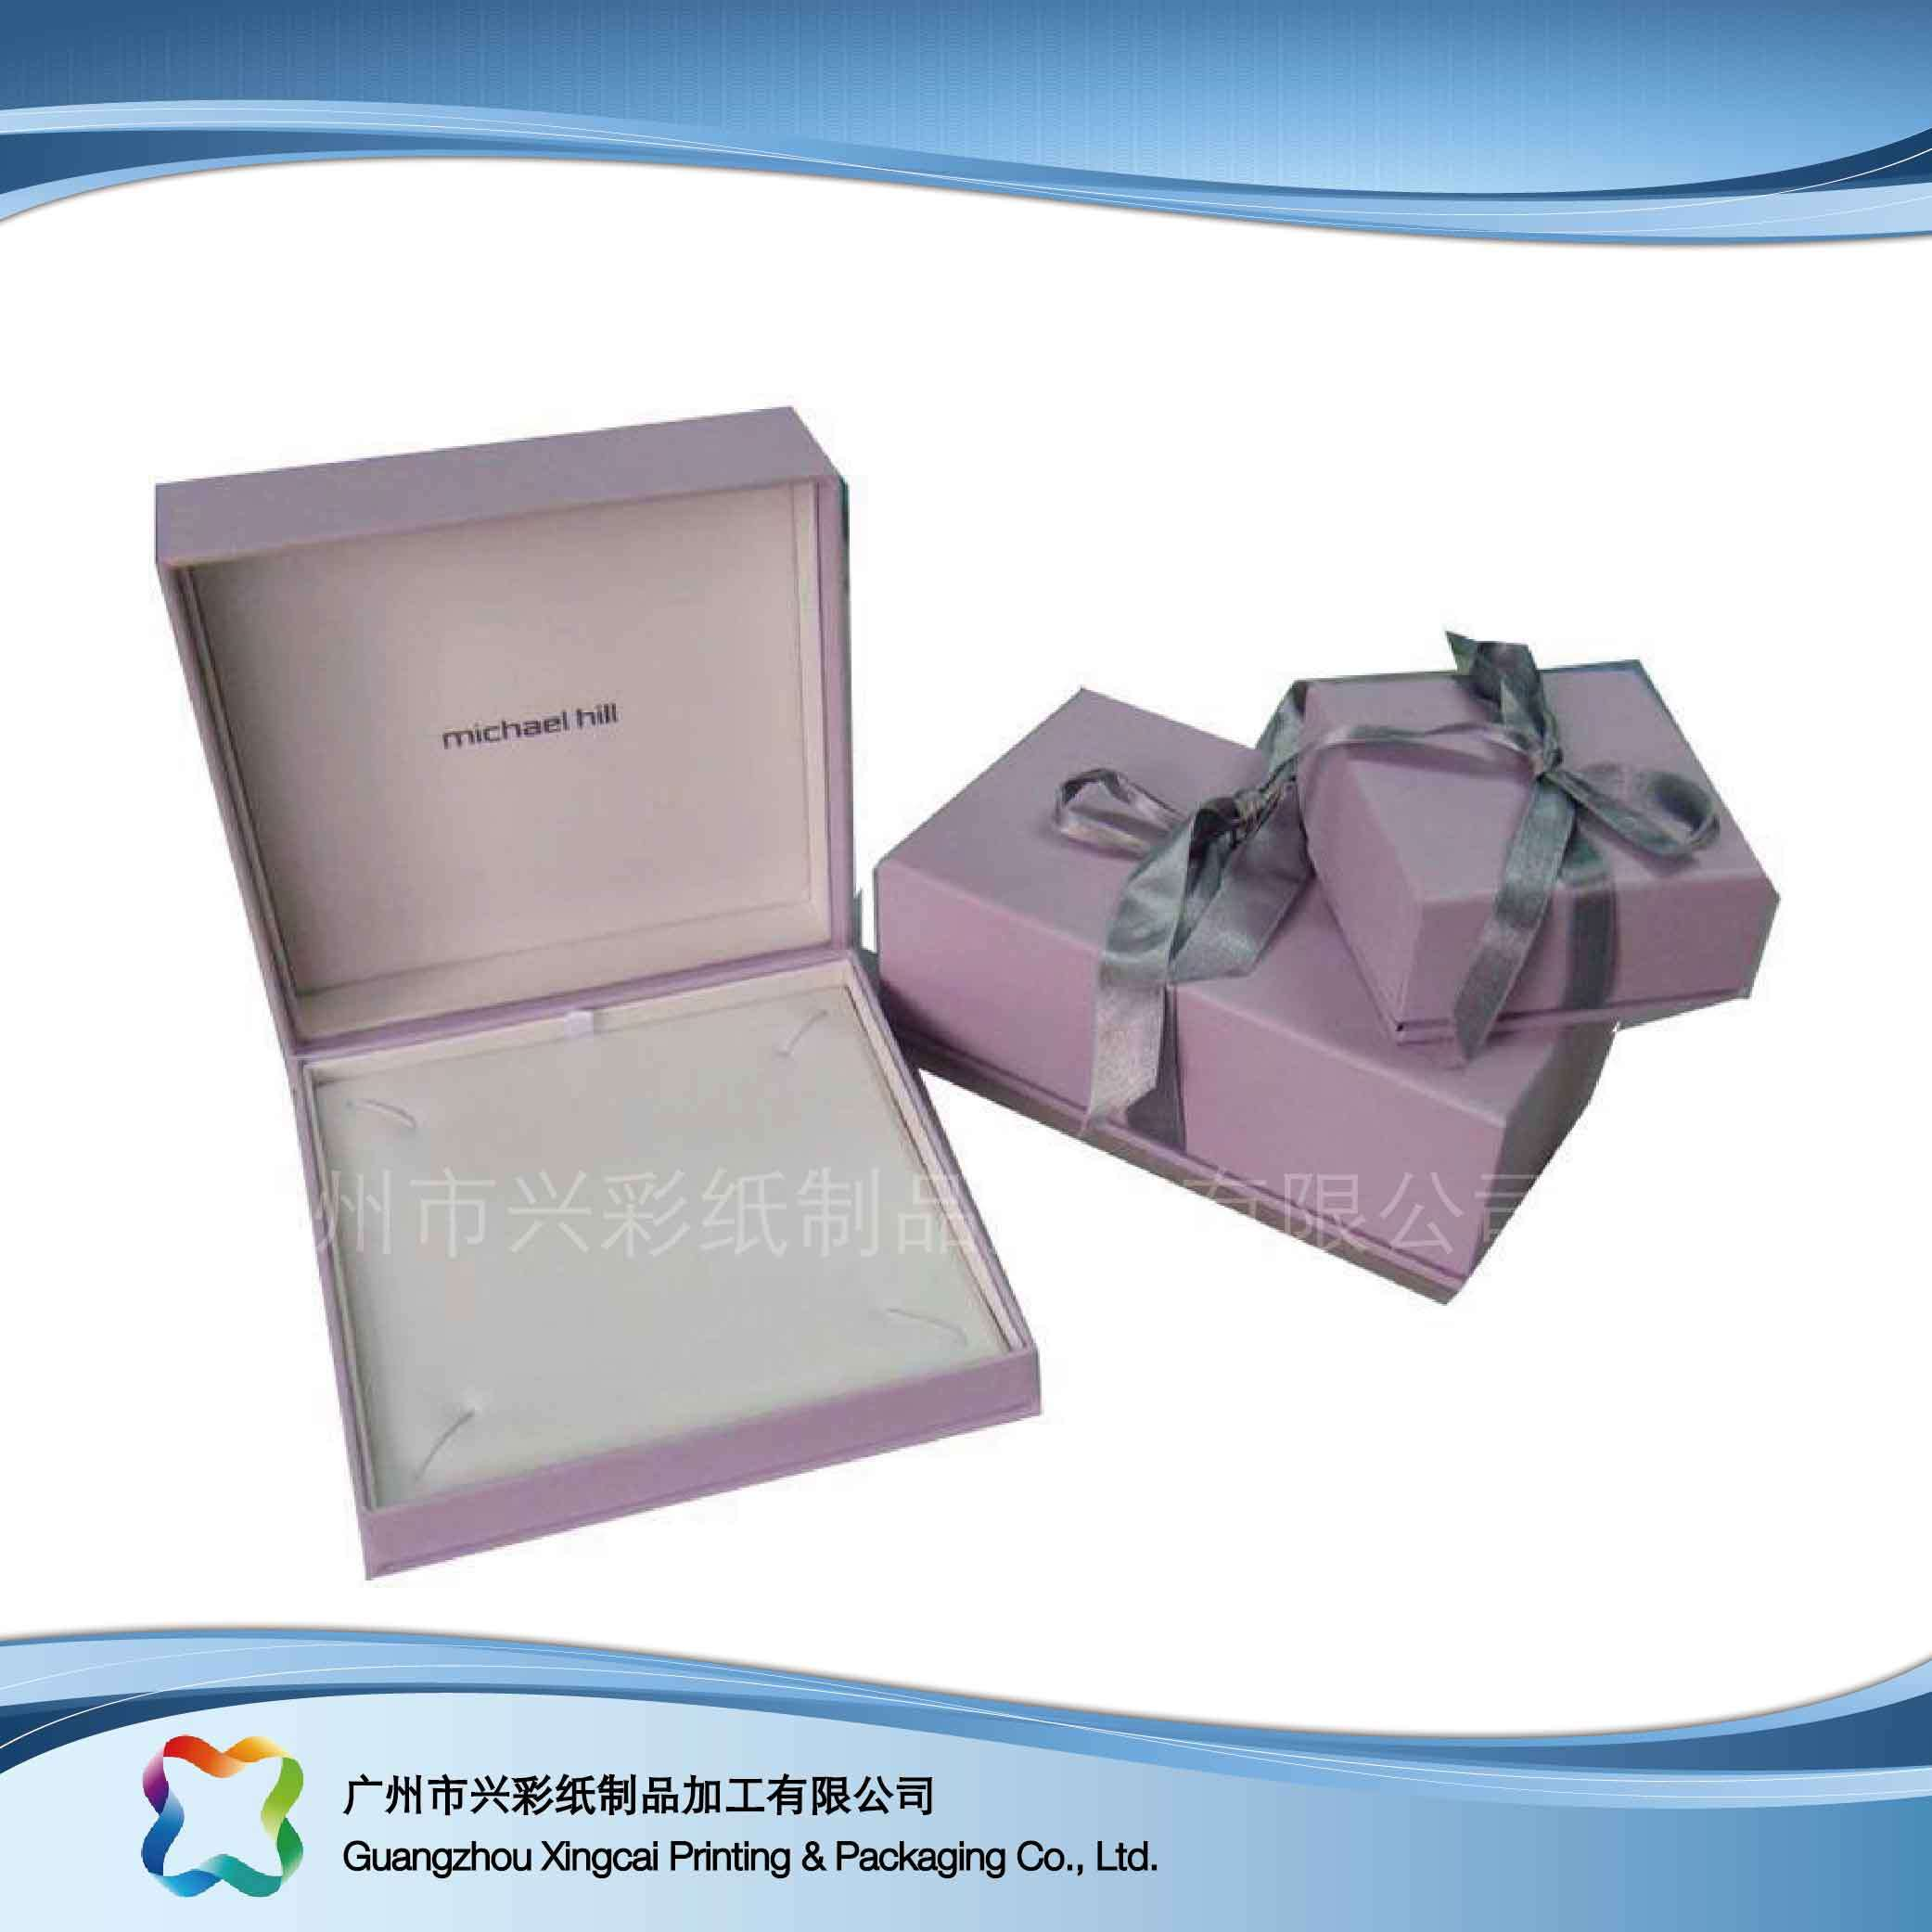 Hot Item Korean Fashion Jewelry Box Custom Jewelry Gift Paper Display Packaging Box Xc Hbj 012